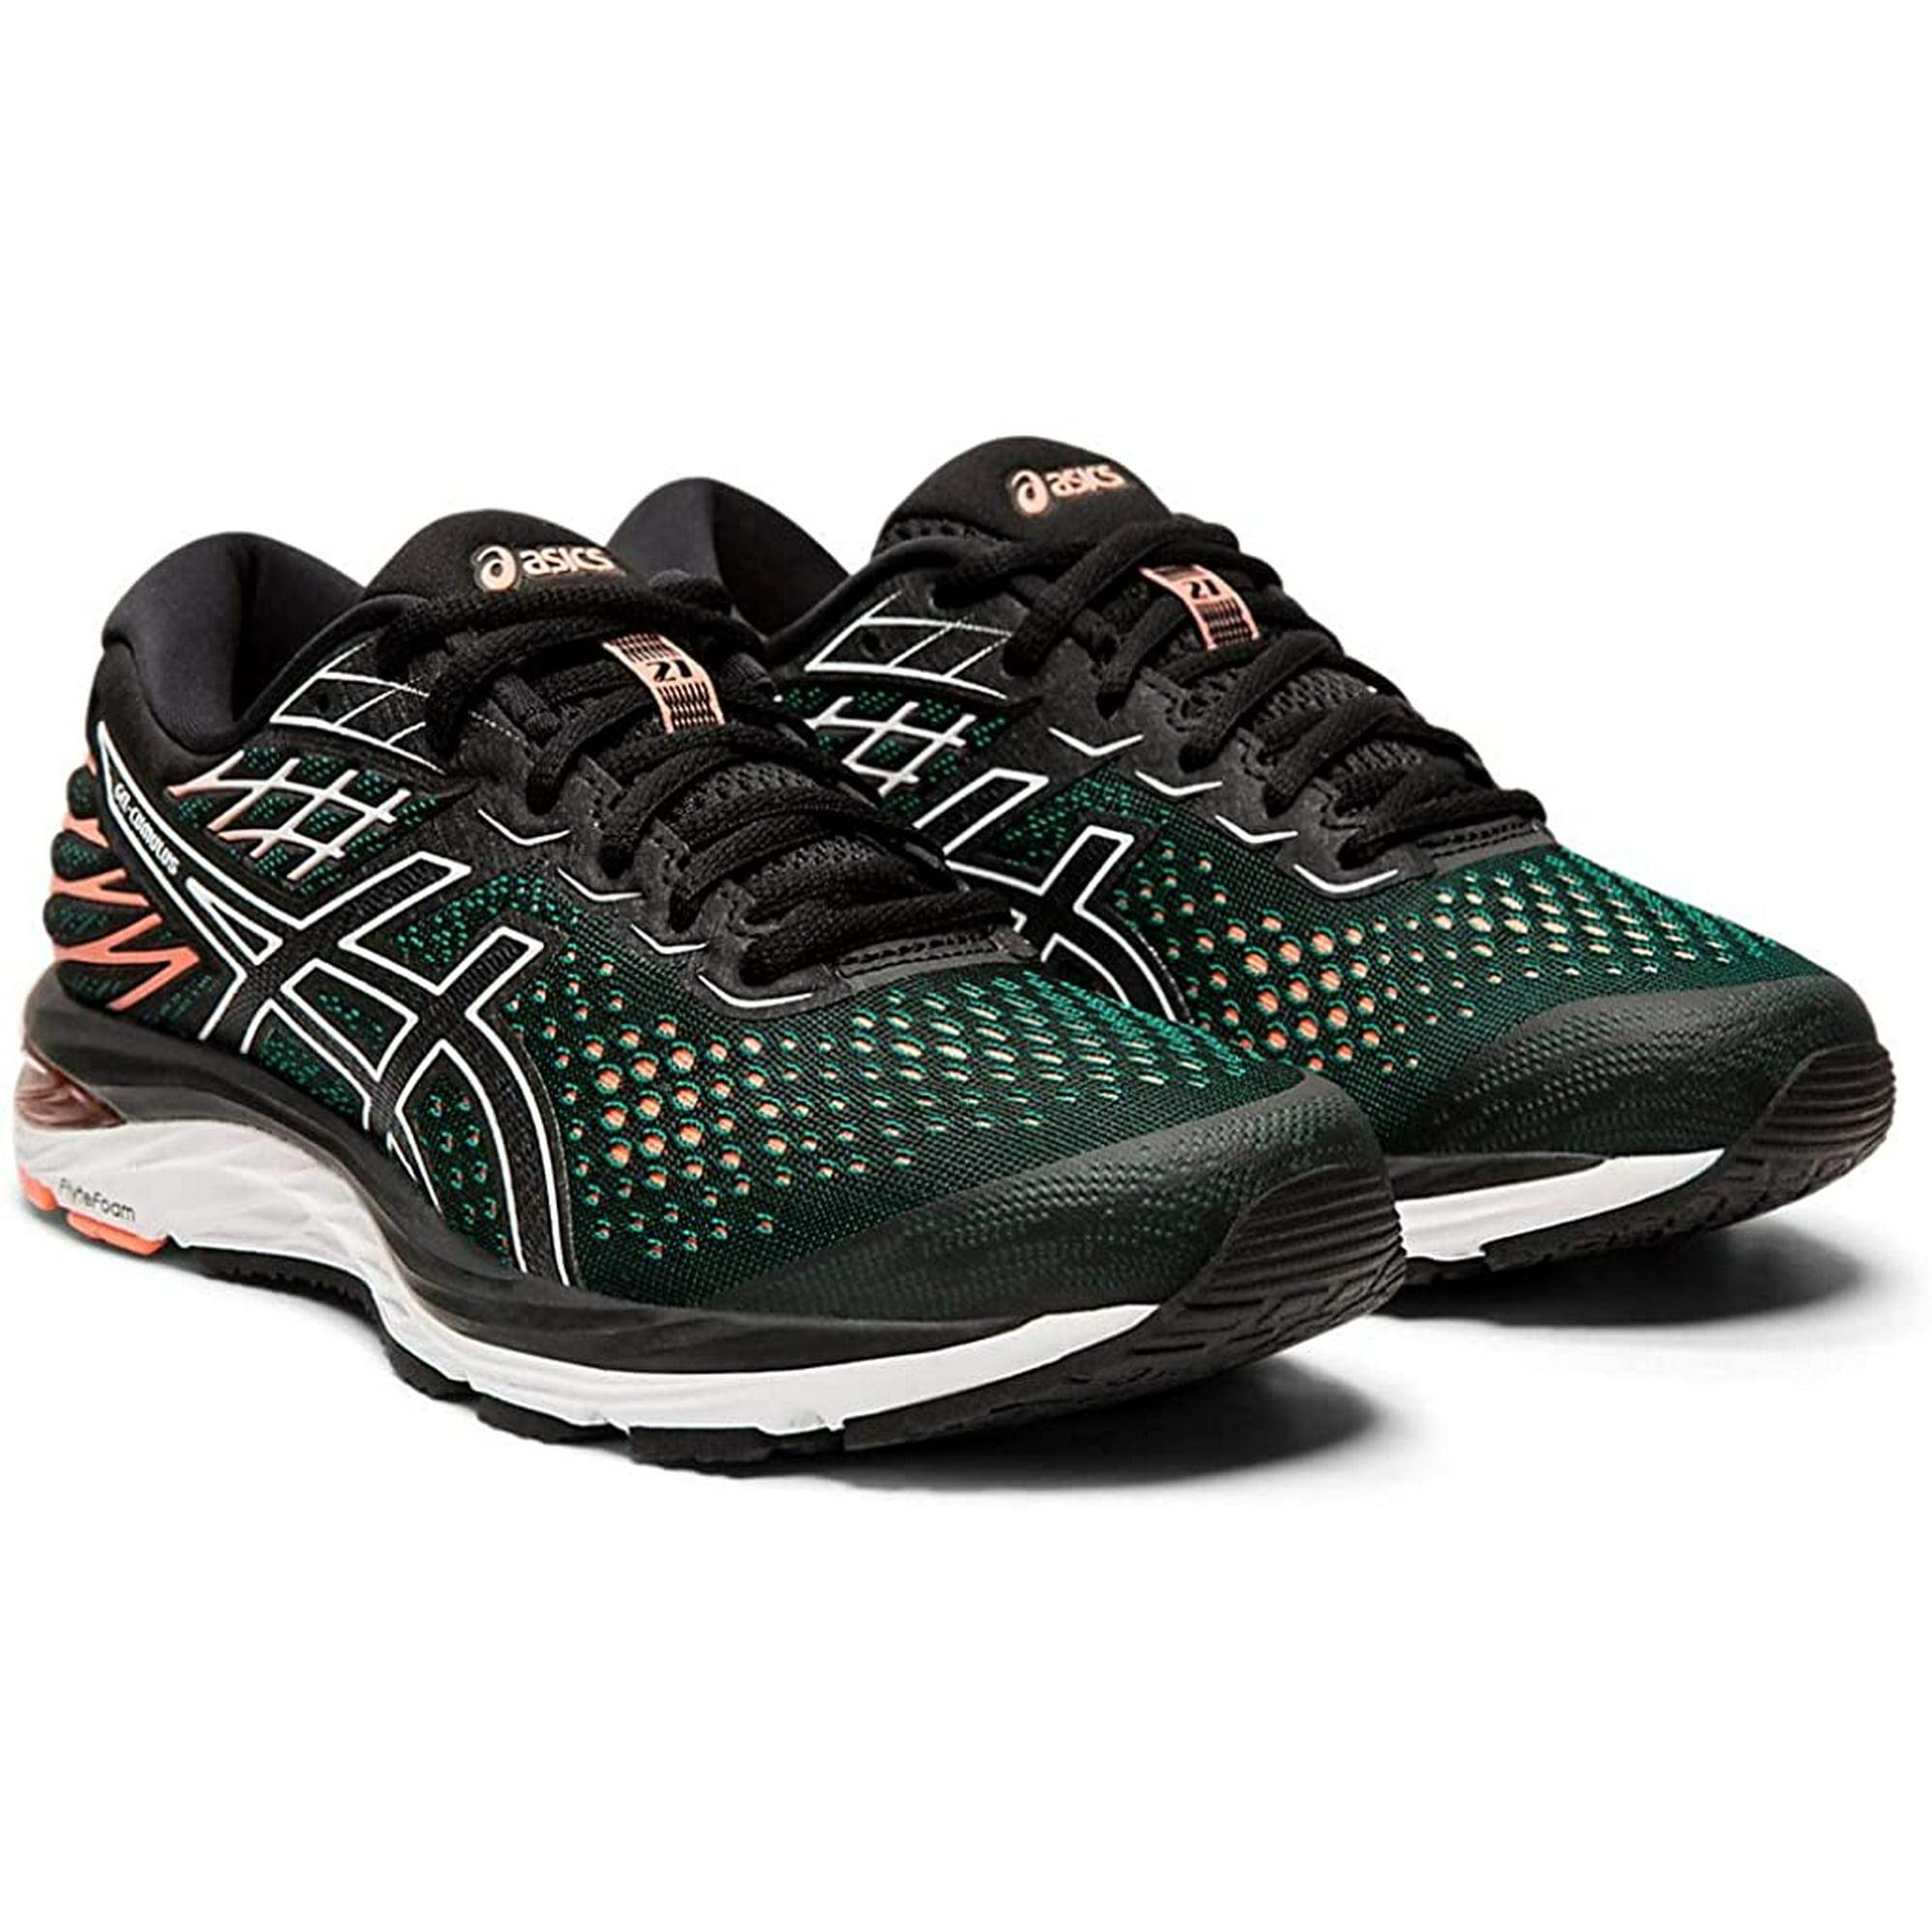 Desalentar concepto Lengua macarrónica  ASICS Women's Gel-Cumulus 21 Running Shoes, 6.5W, Black/Sun Coral | Walmart  Canada